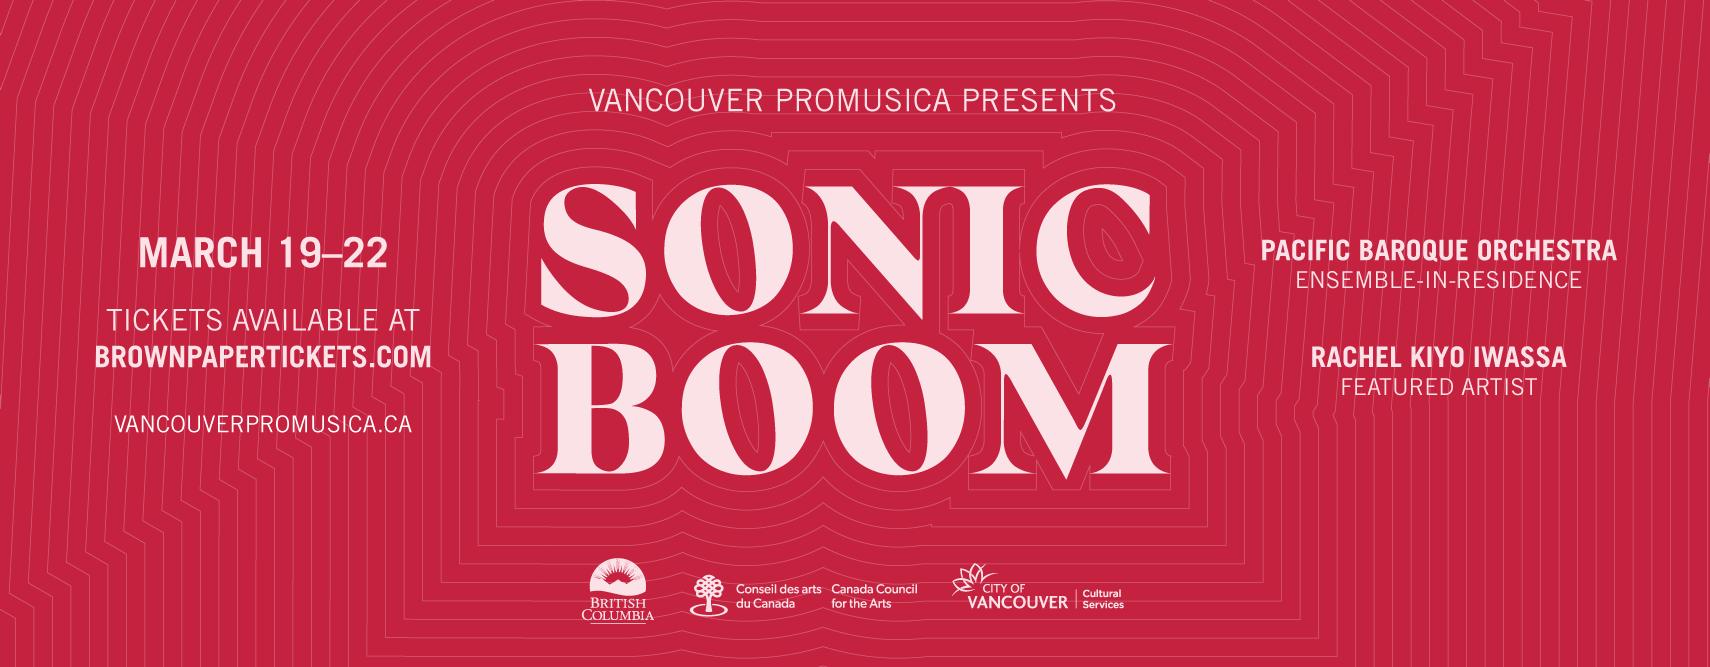 Sonic Boom 2020: March 19-22, 2020 - Vancouver Pro Musica